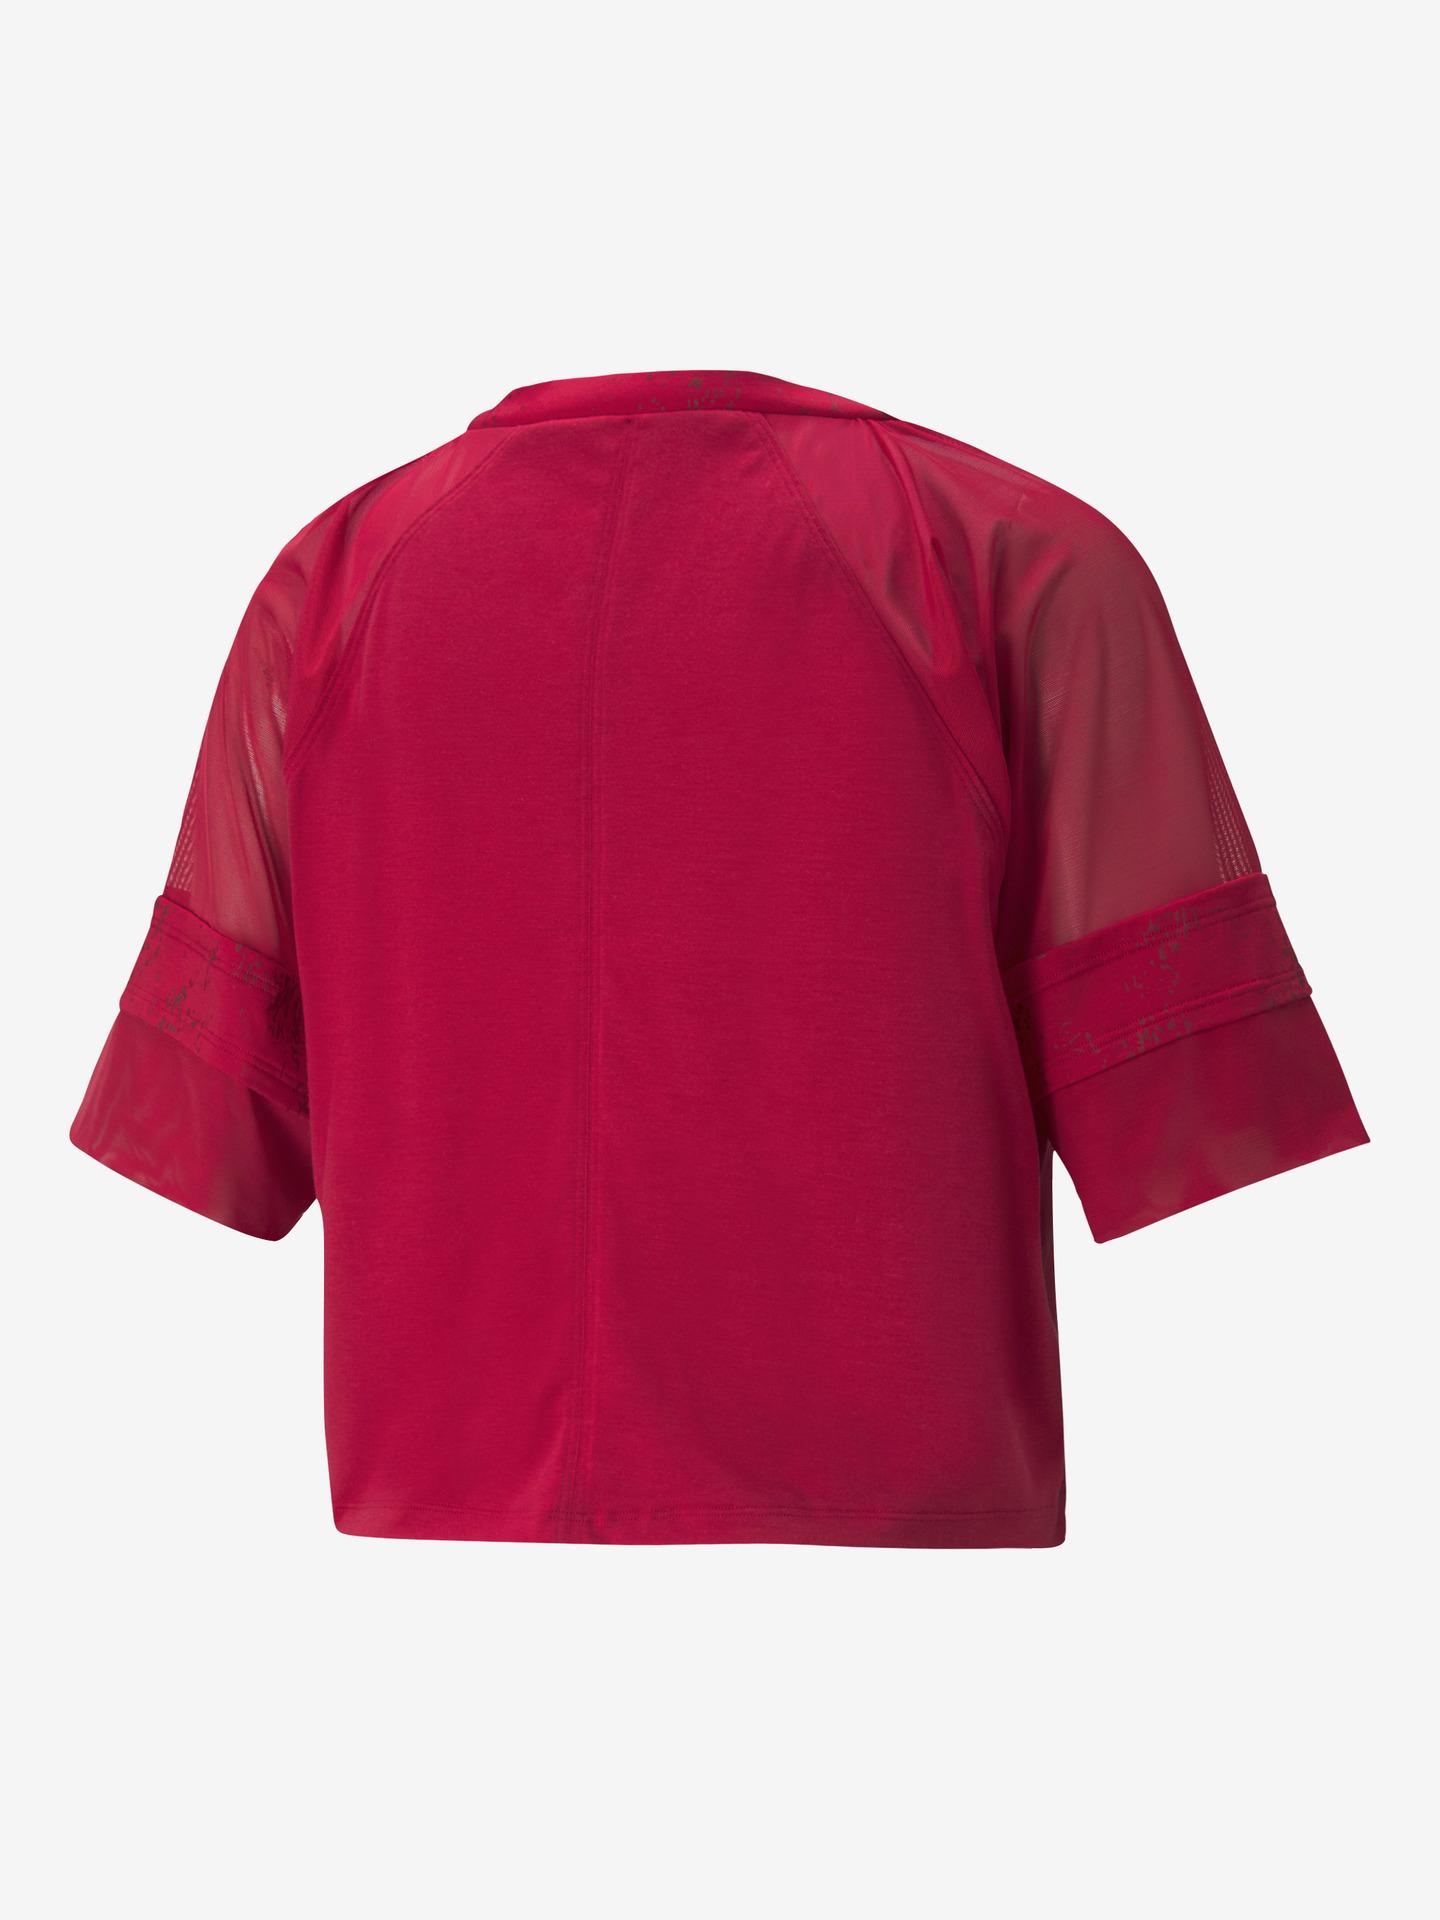 Puma Women's t-shirt red